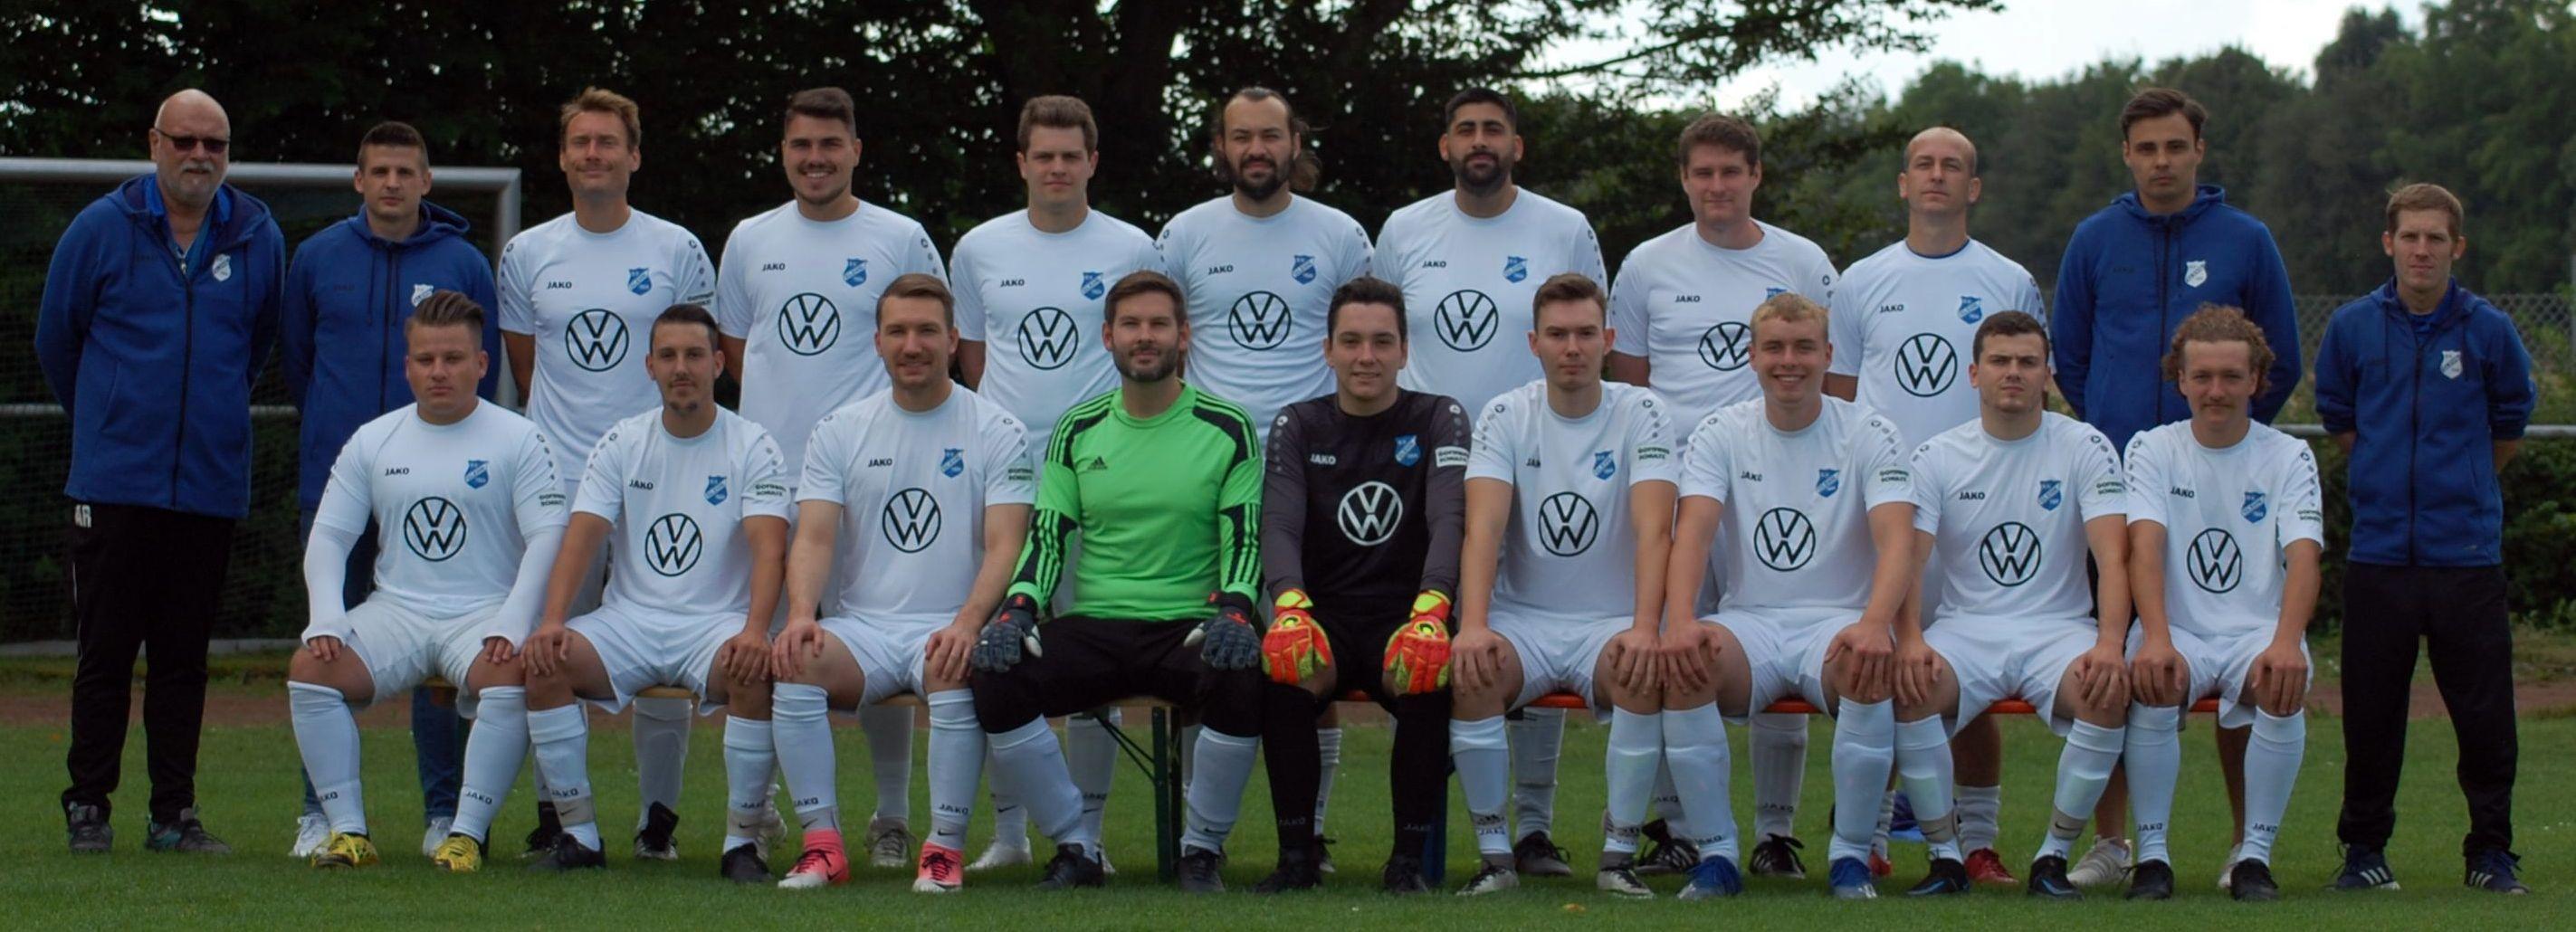 2. Senioren - Zur Mannschaft | SV 1924 Glehn e.V.